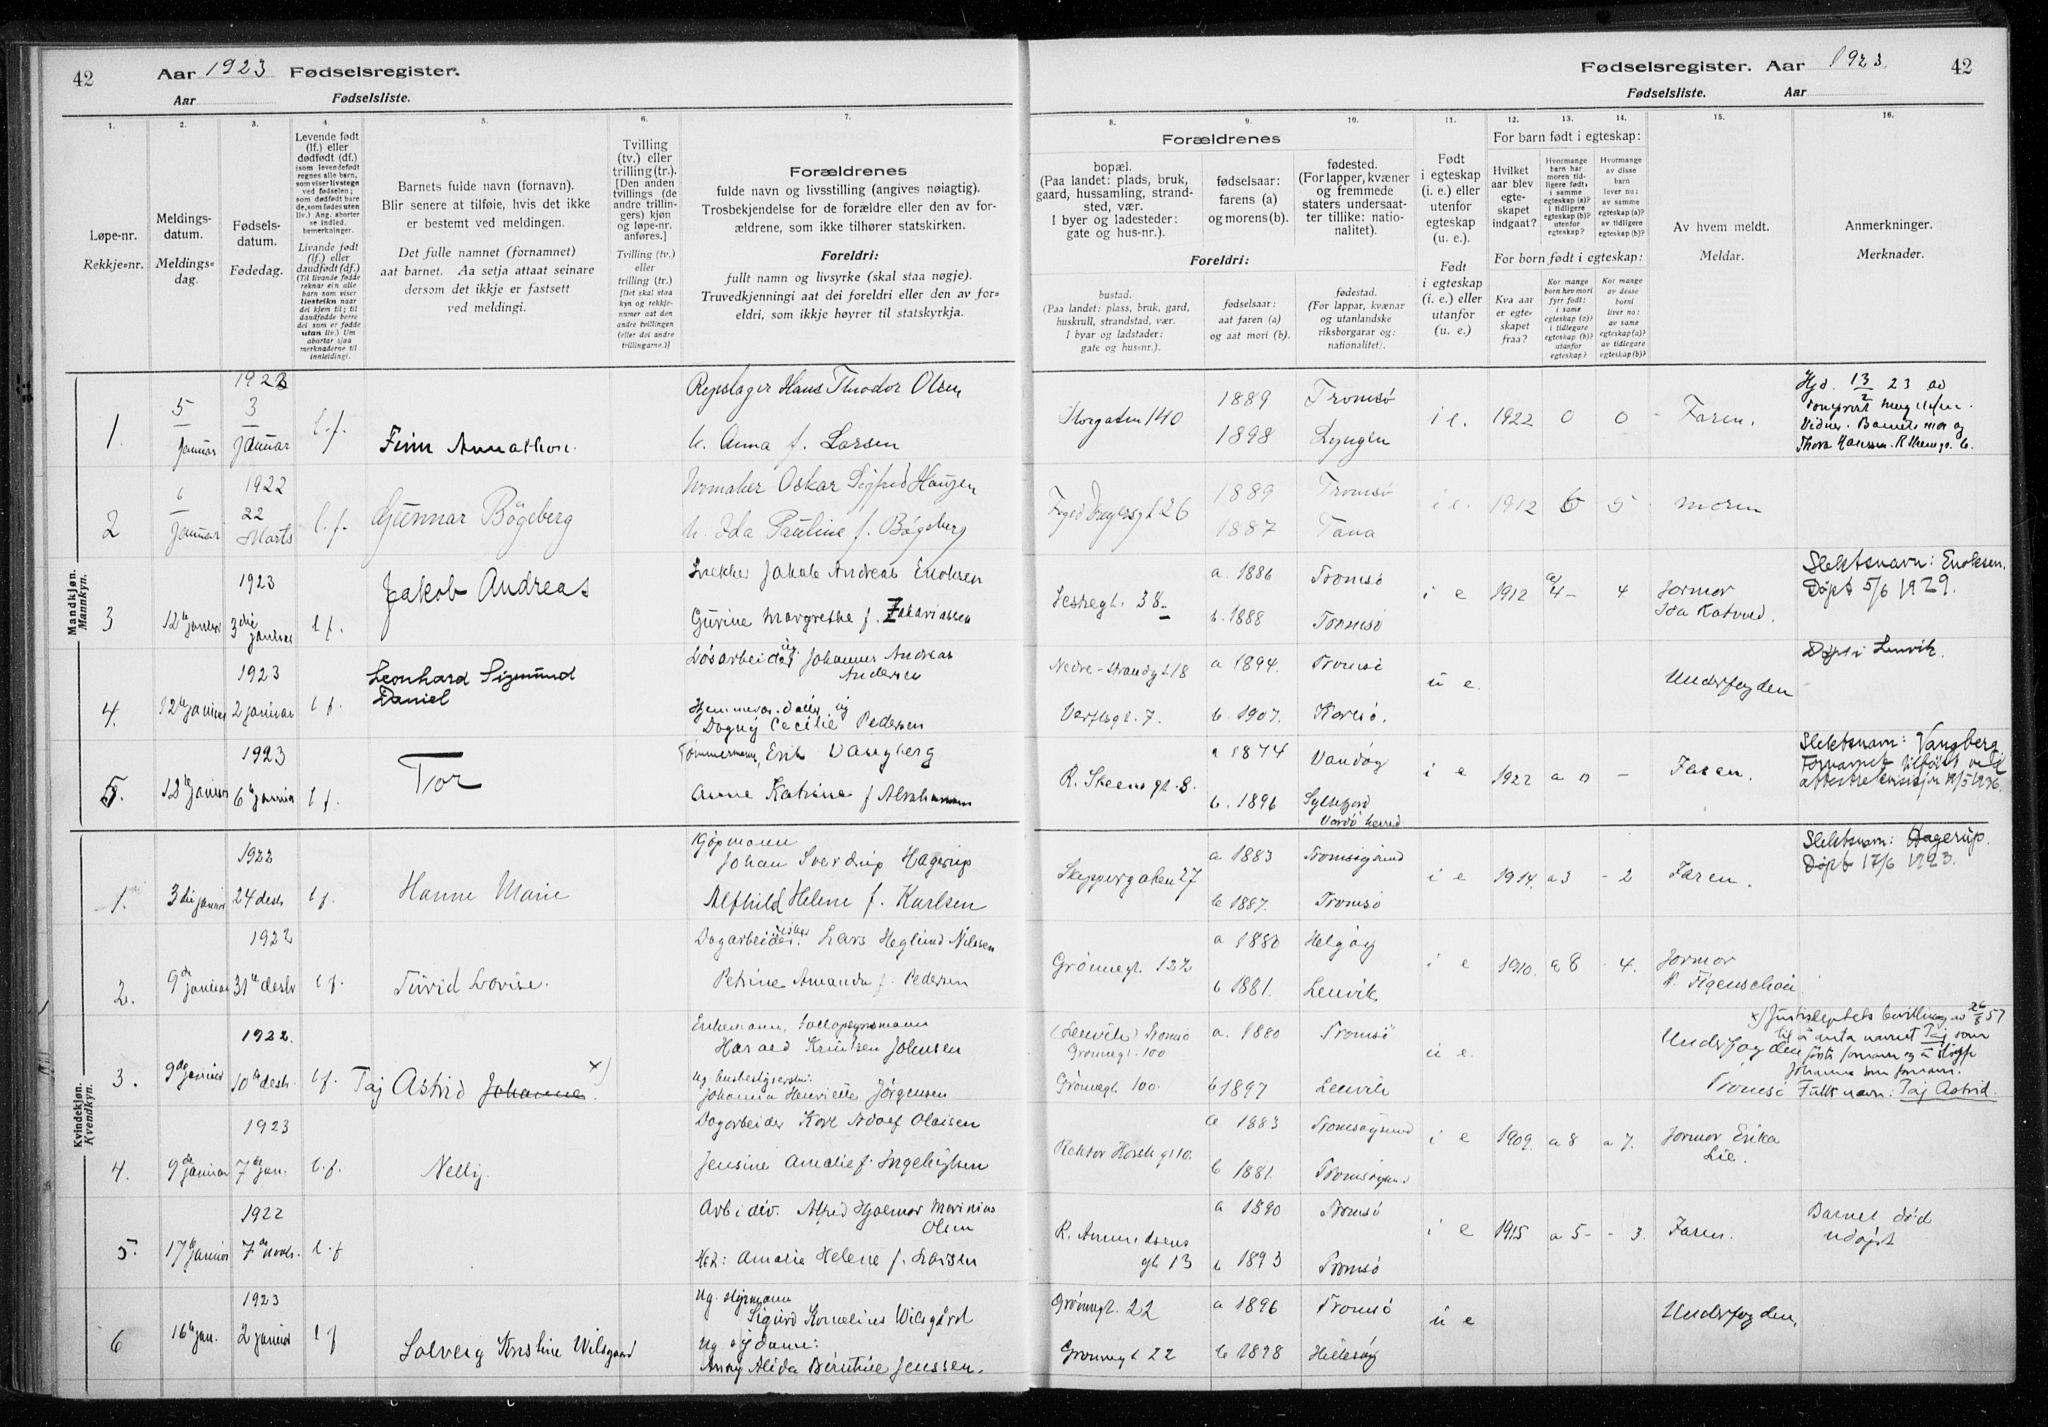 SATØ, Tromsø sokneprestkontor/stiftsprosti/domprosti, H/Ha/L0132: Fødselsregister nr. 132, 1921-1927, s. 42